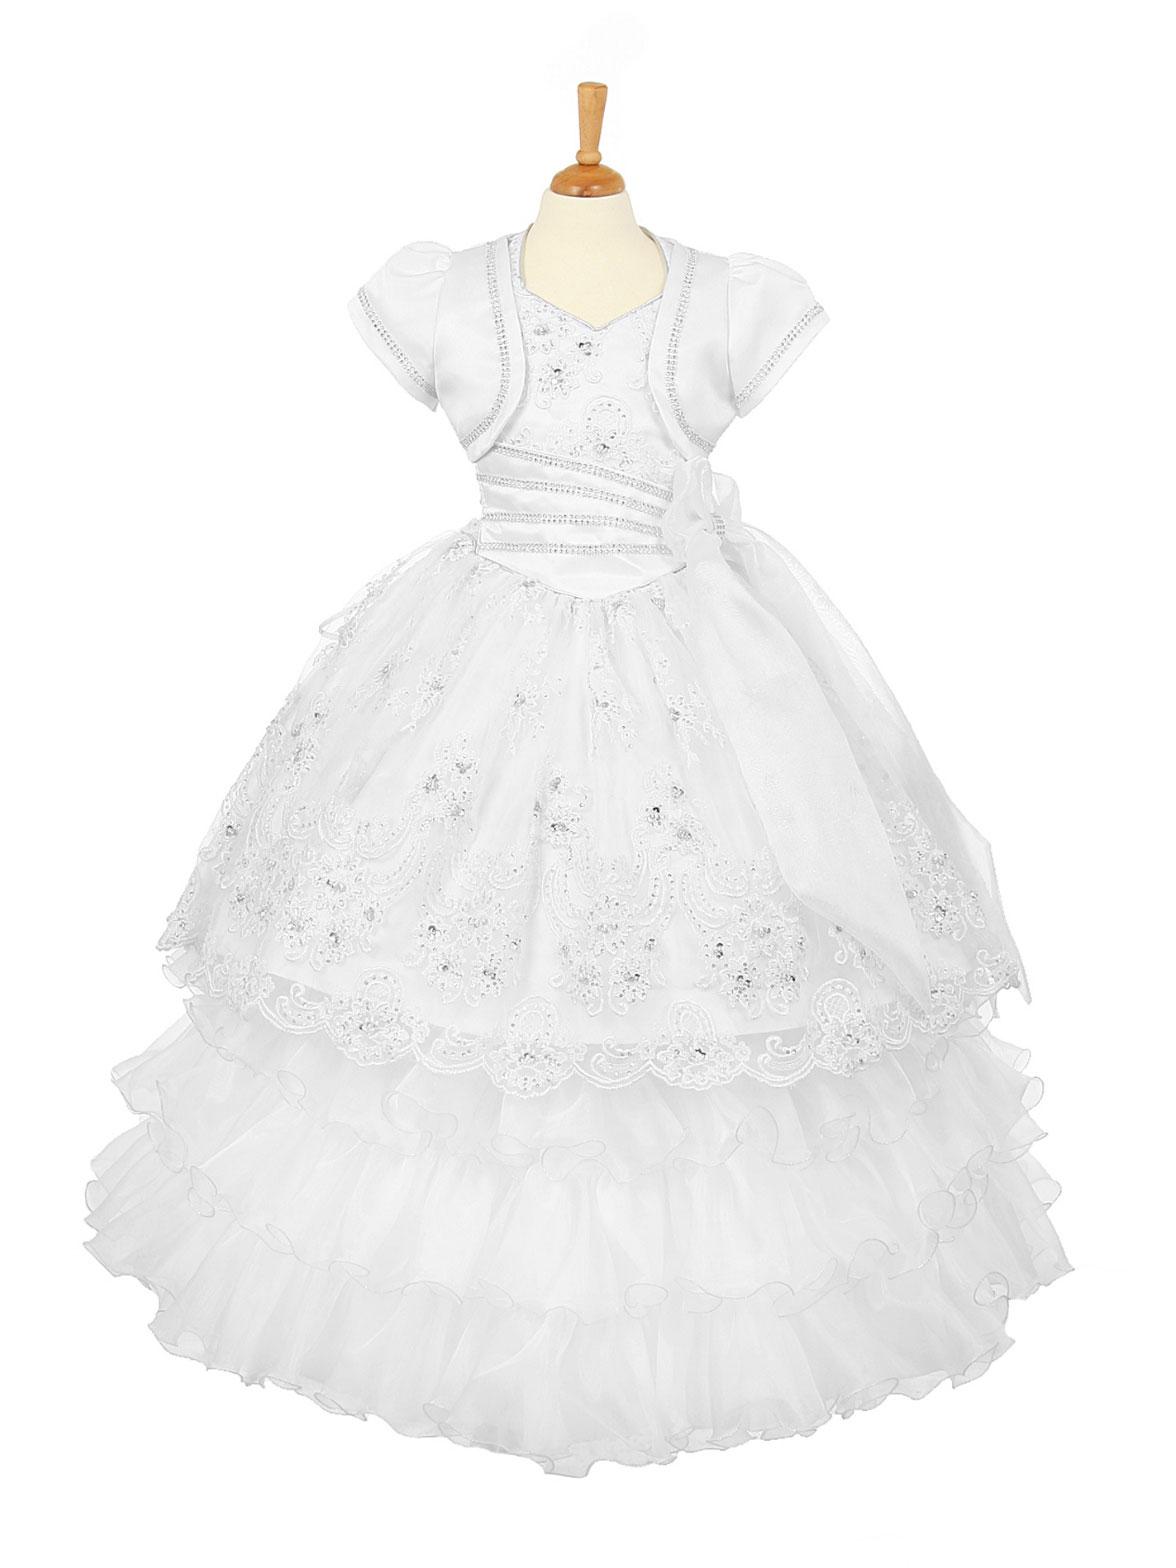 Rk 2019 Girls Dress Style 2019 White Halter Top